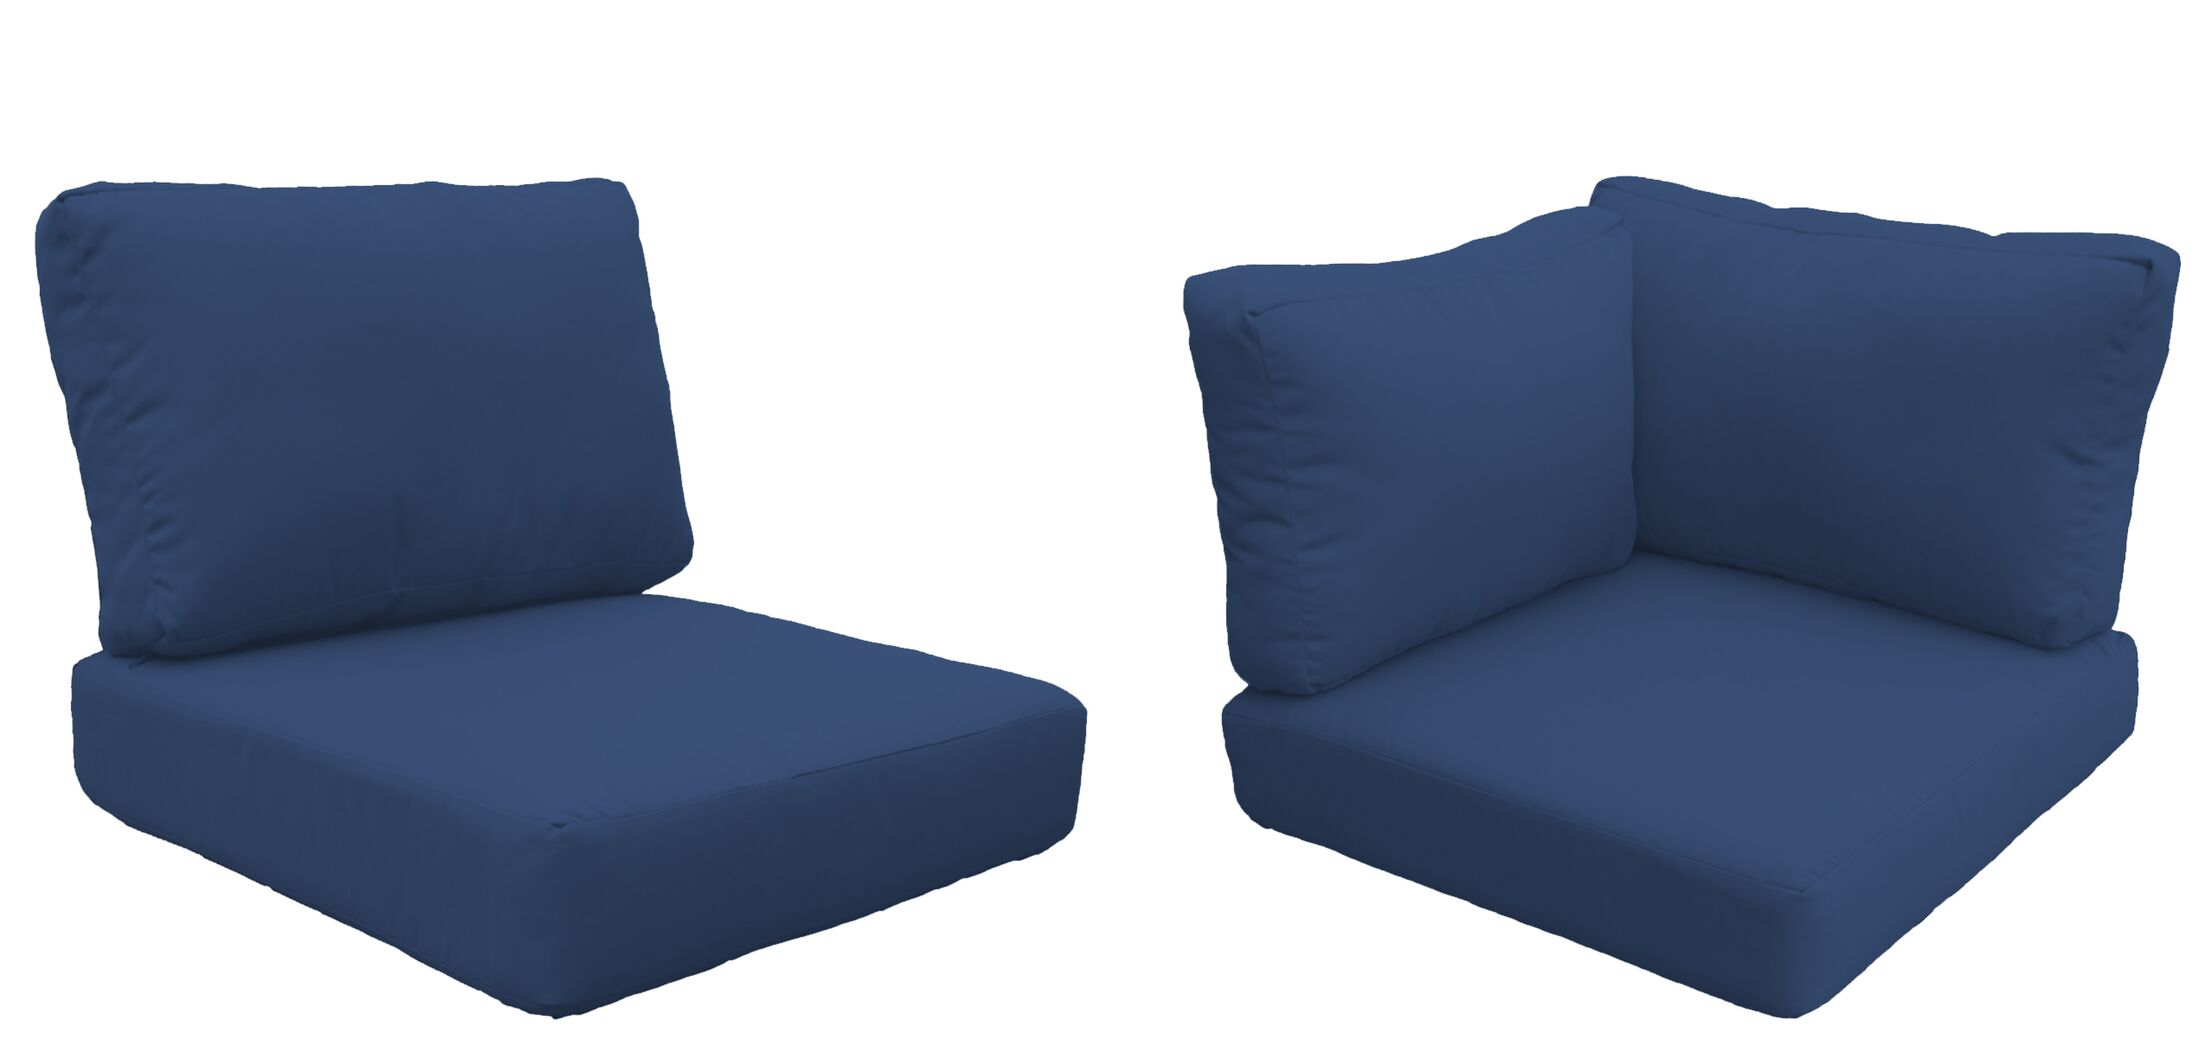 Florence 10 Piece Outdoor Cushion Set Fabric: Navy